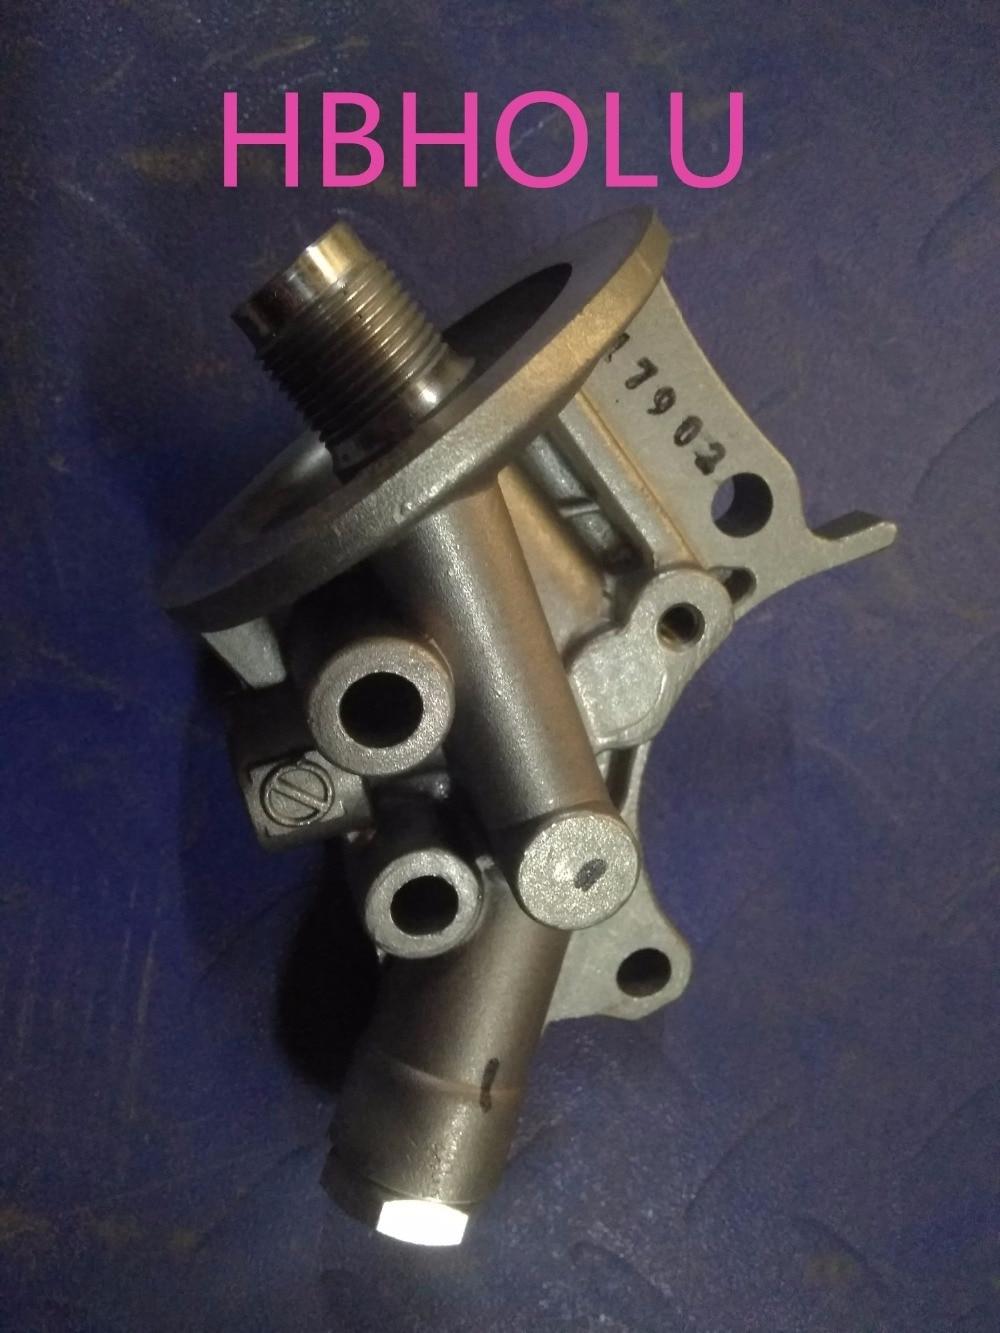 Filtr oleju siedzenia SMD189888 dla great wall haval 4G64 engien